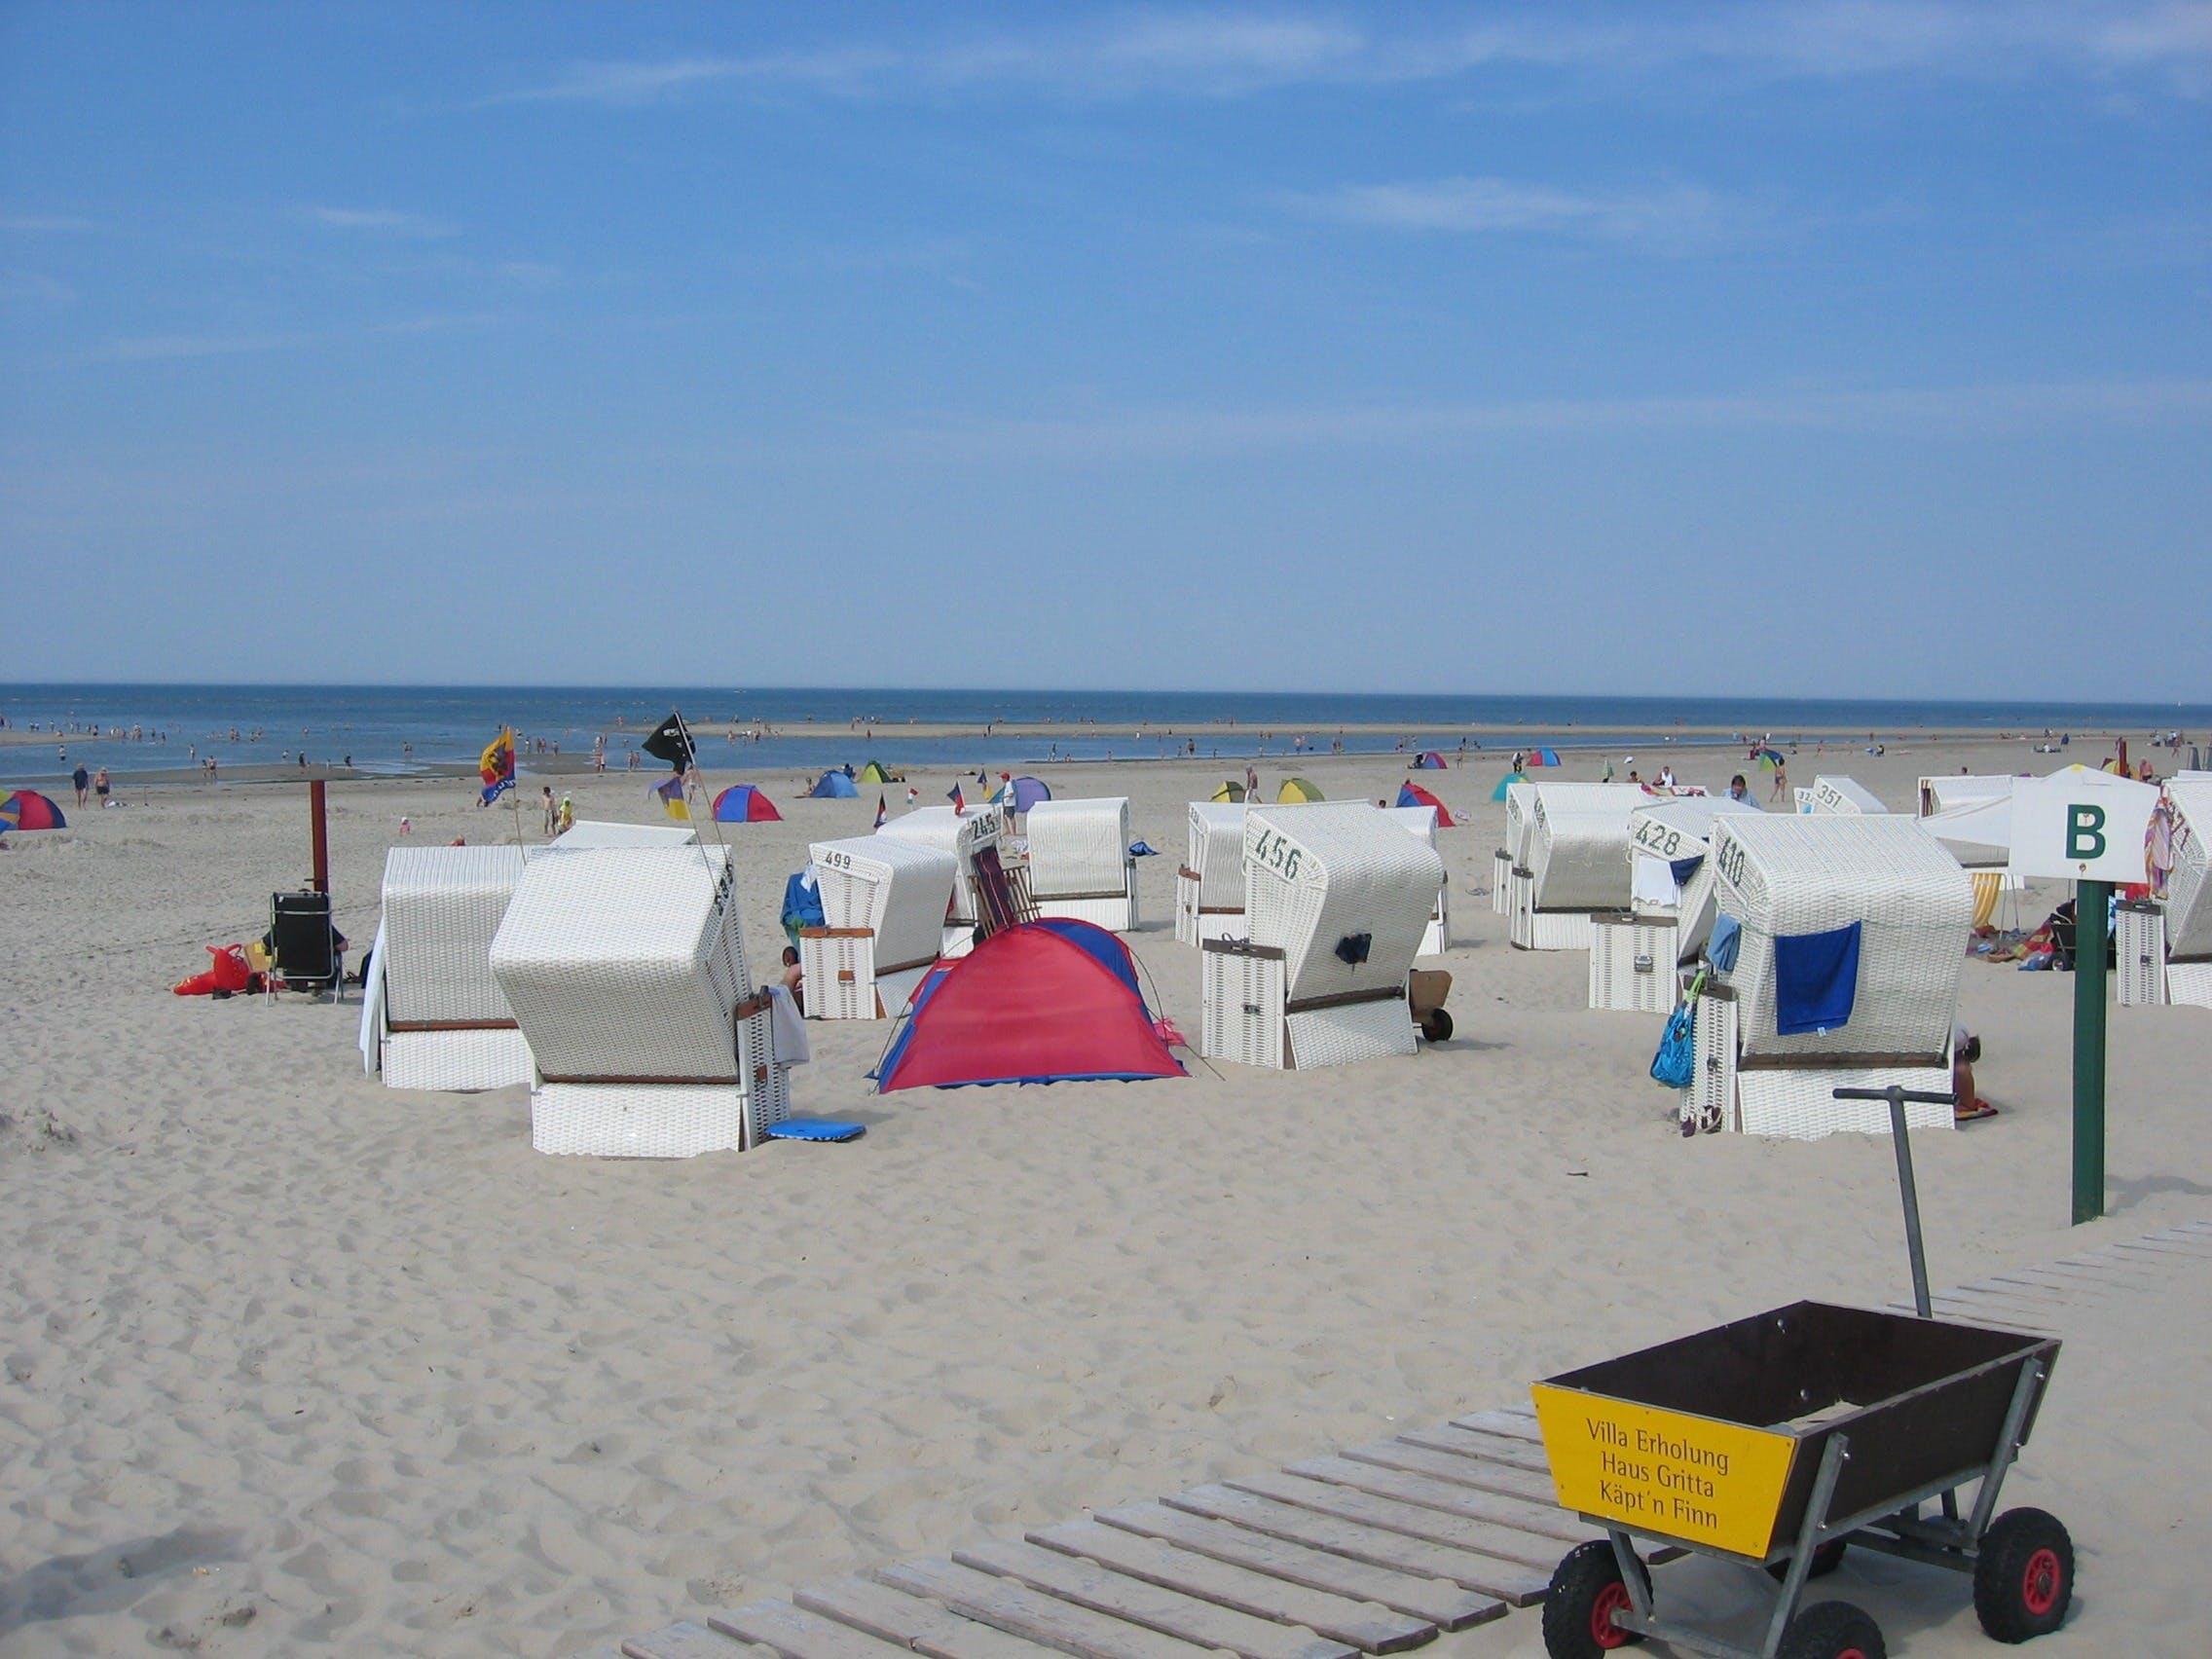 Free stock photo of beach, sand, North Sea, clubs